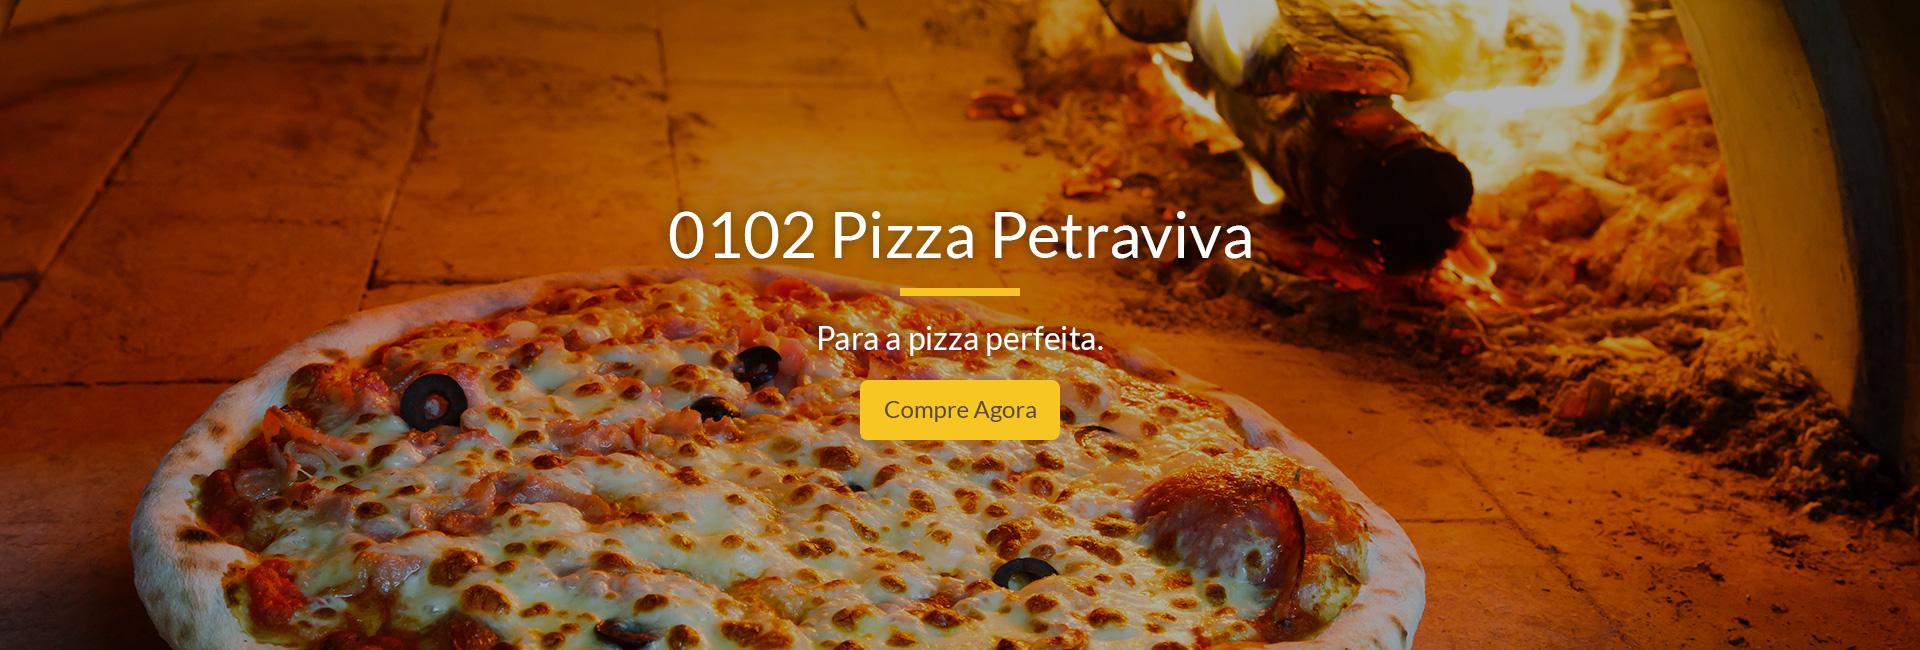 0102 Pizza Petraviva